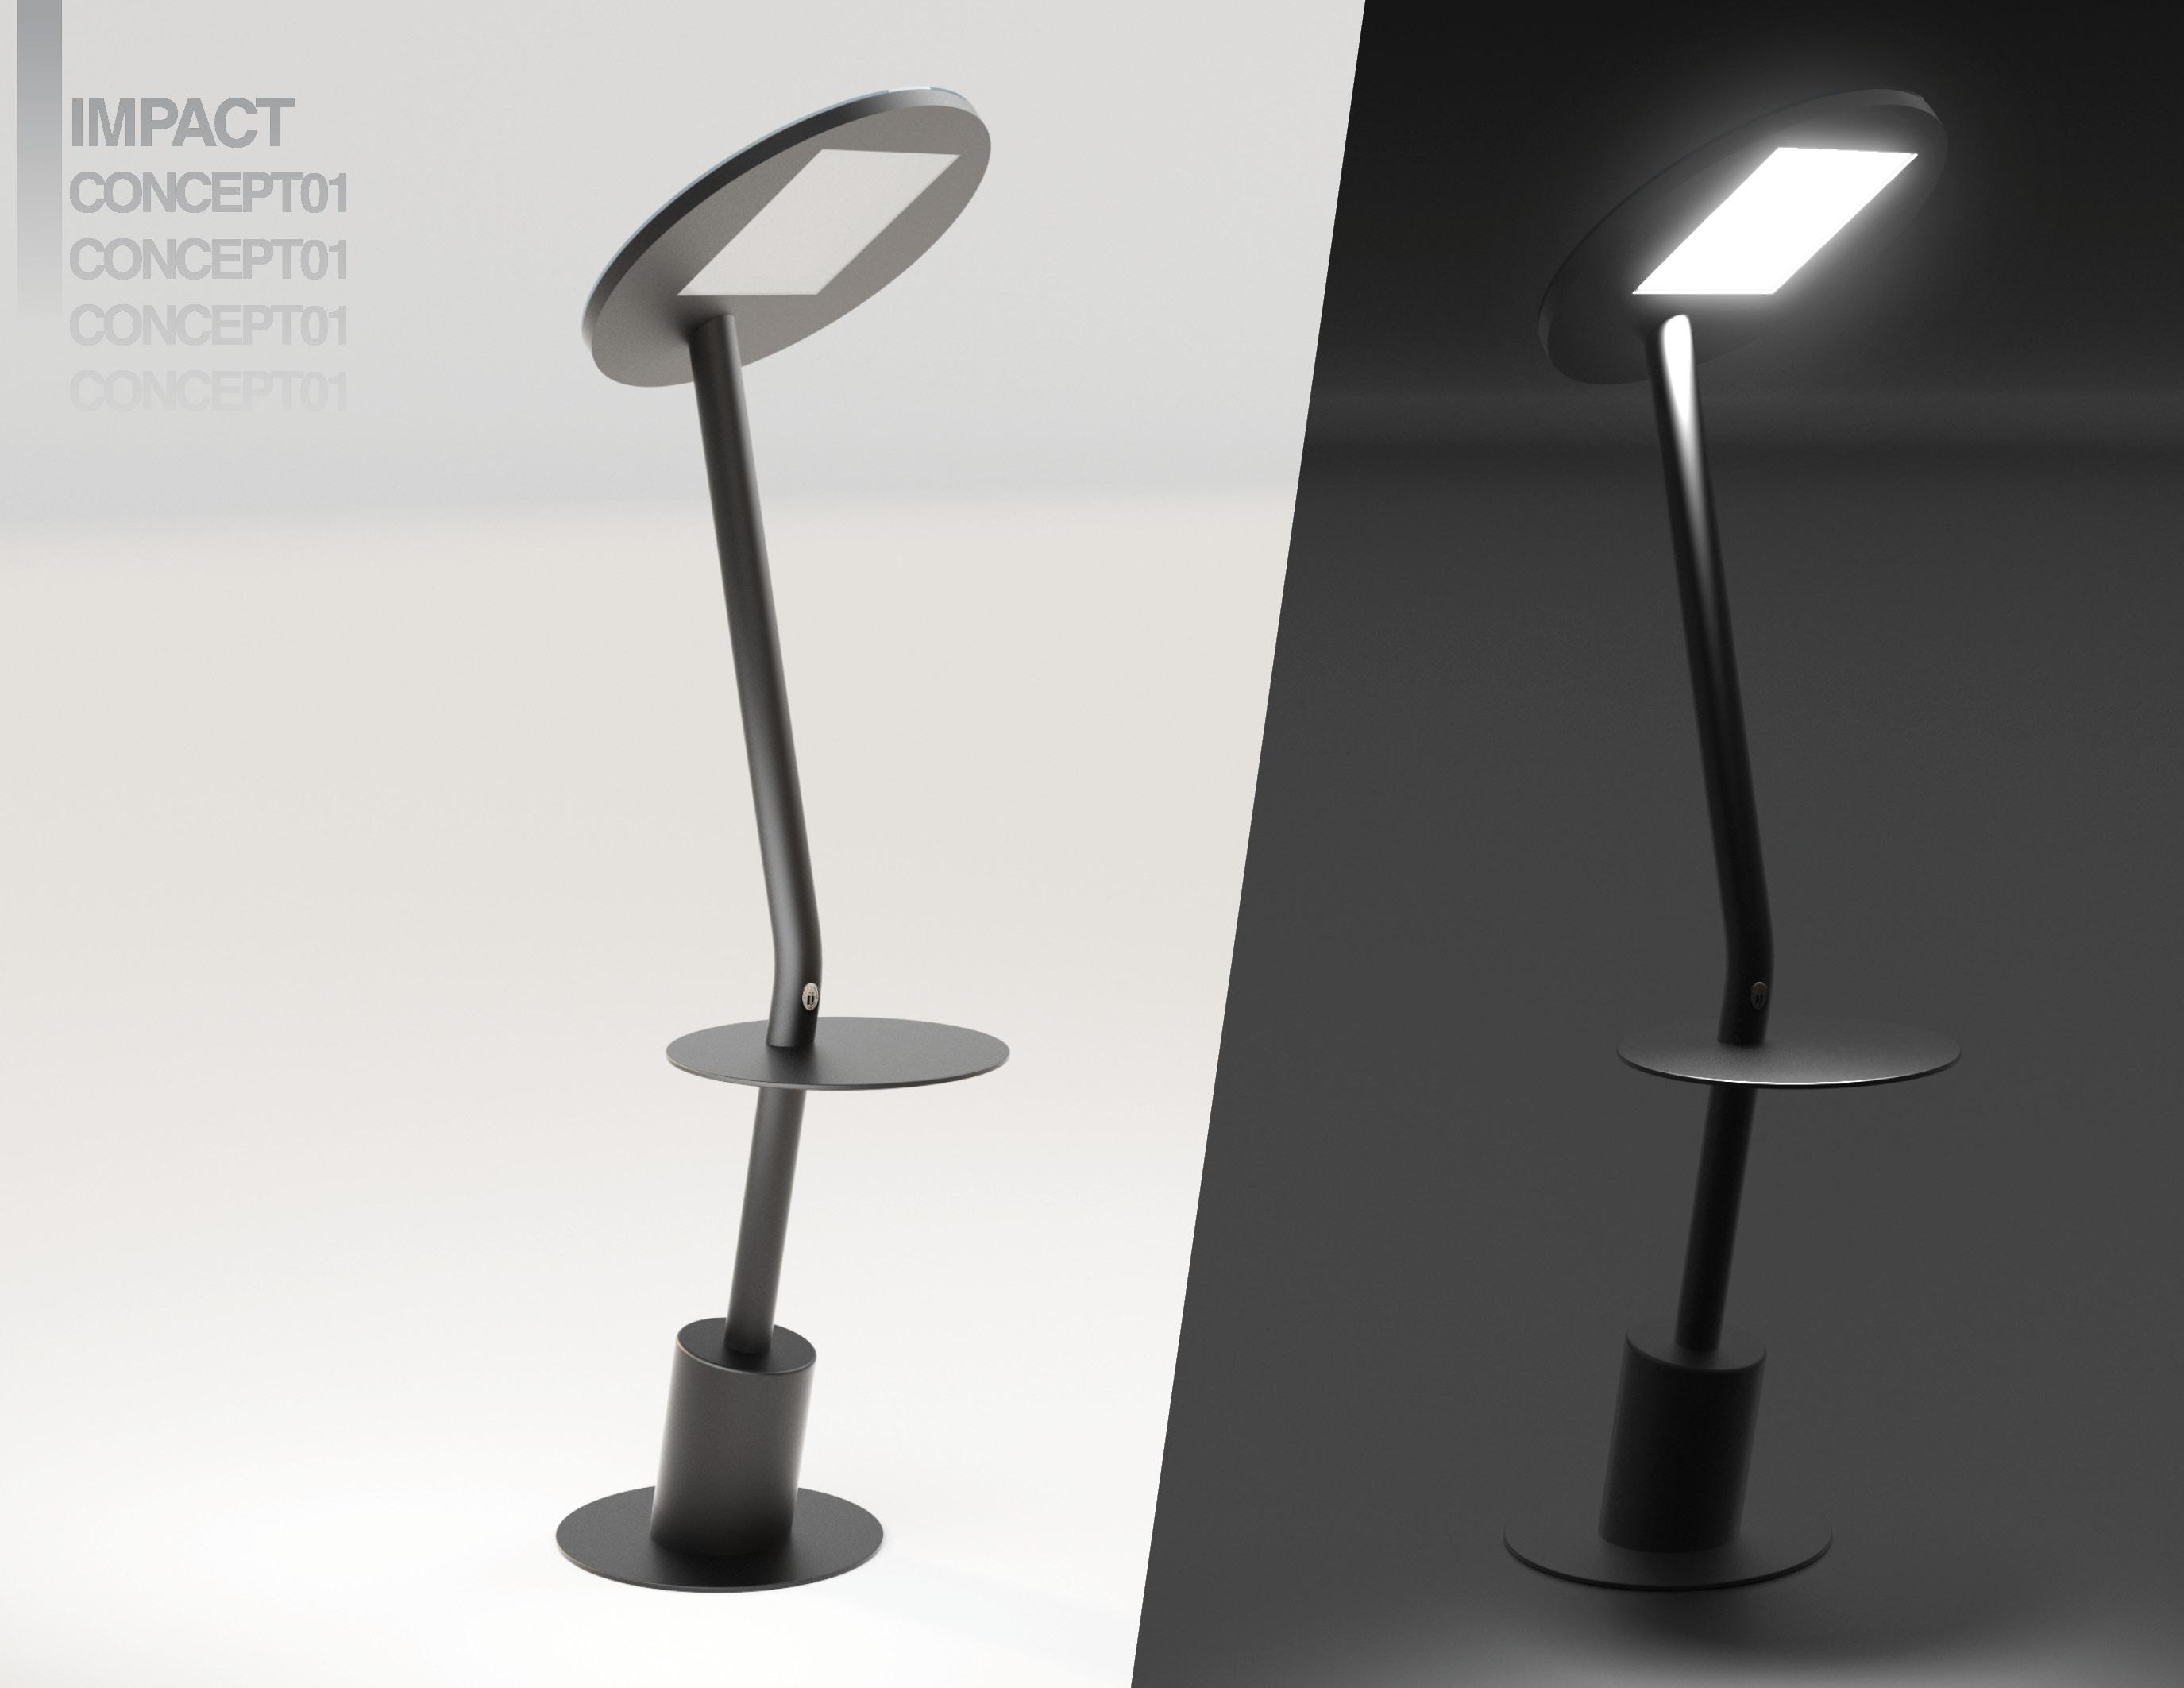 usb_chargingstation_concepts